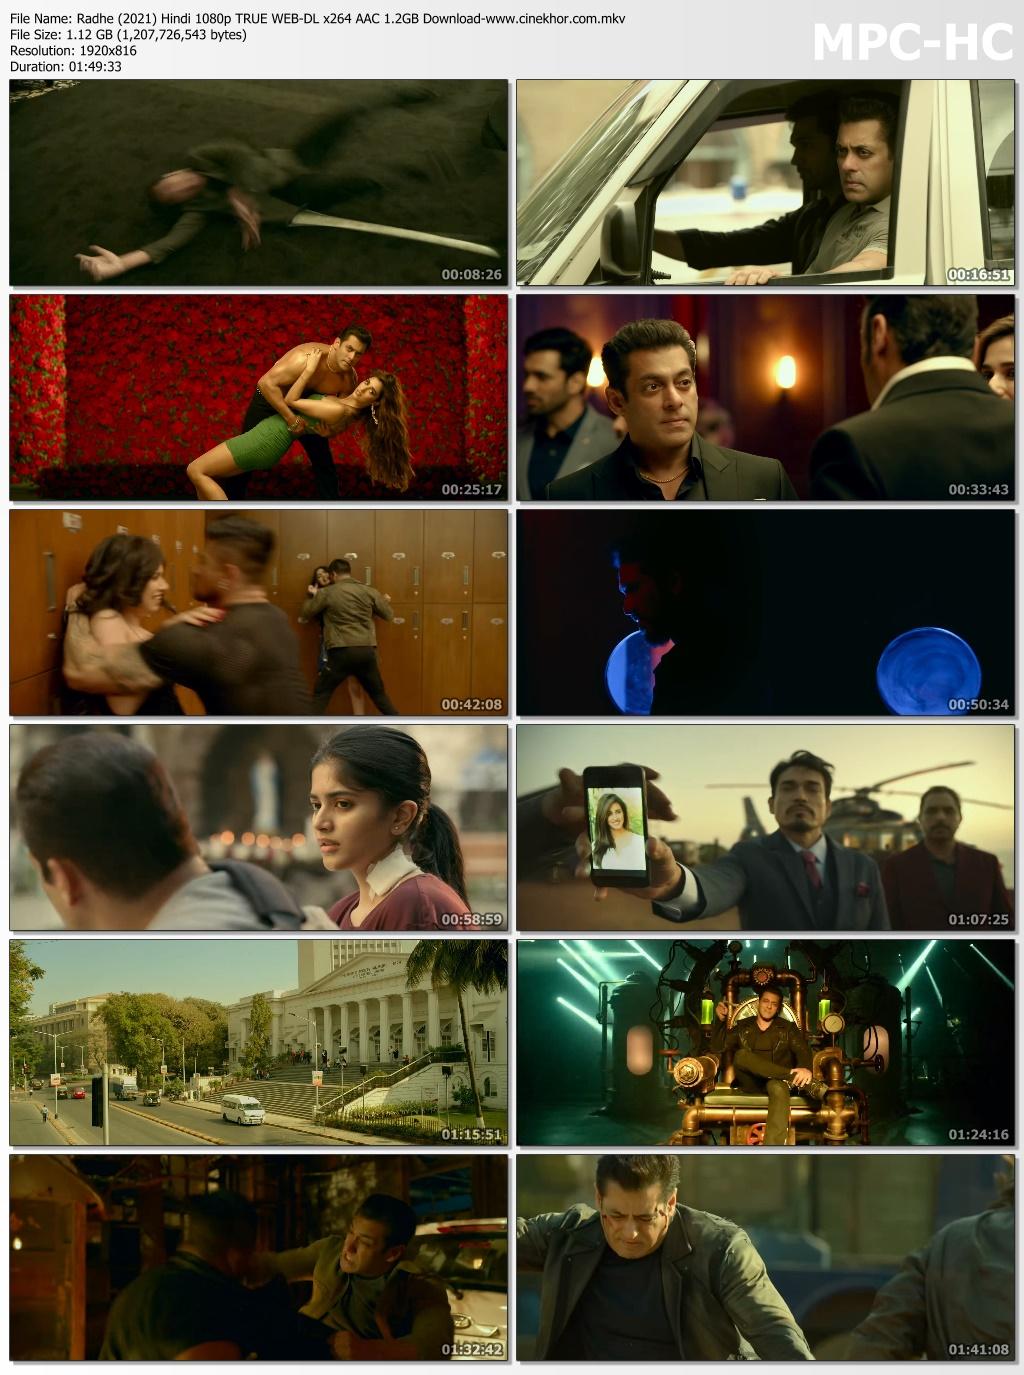 Radhe Hindi Movie 2021 480p HDRip 400MB Download